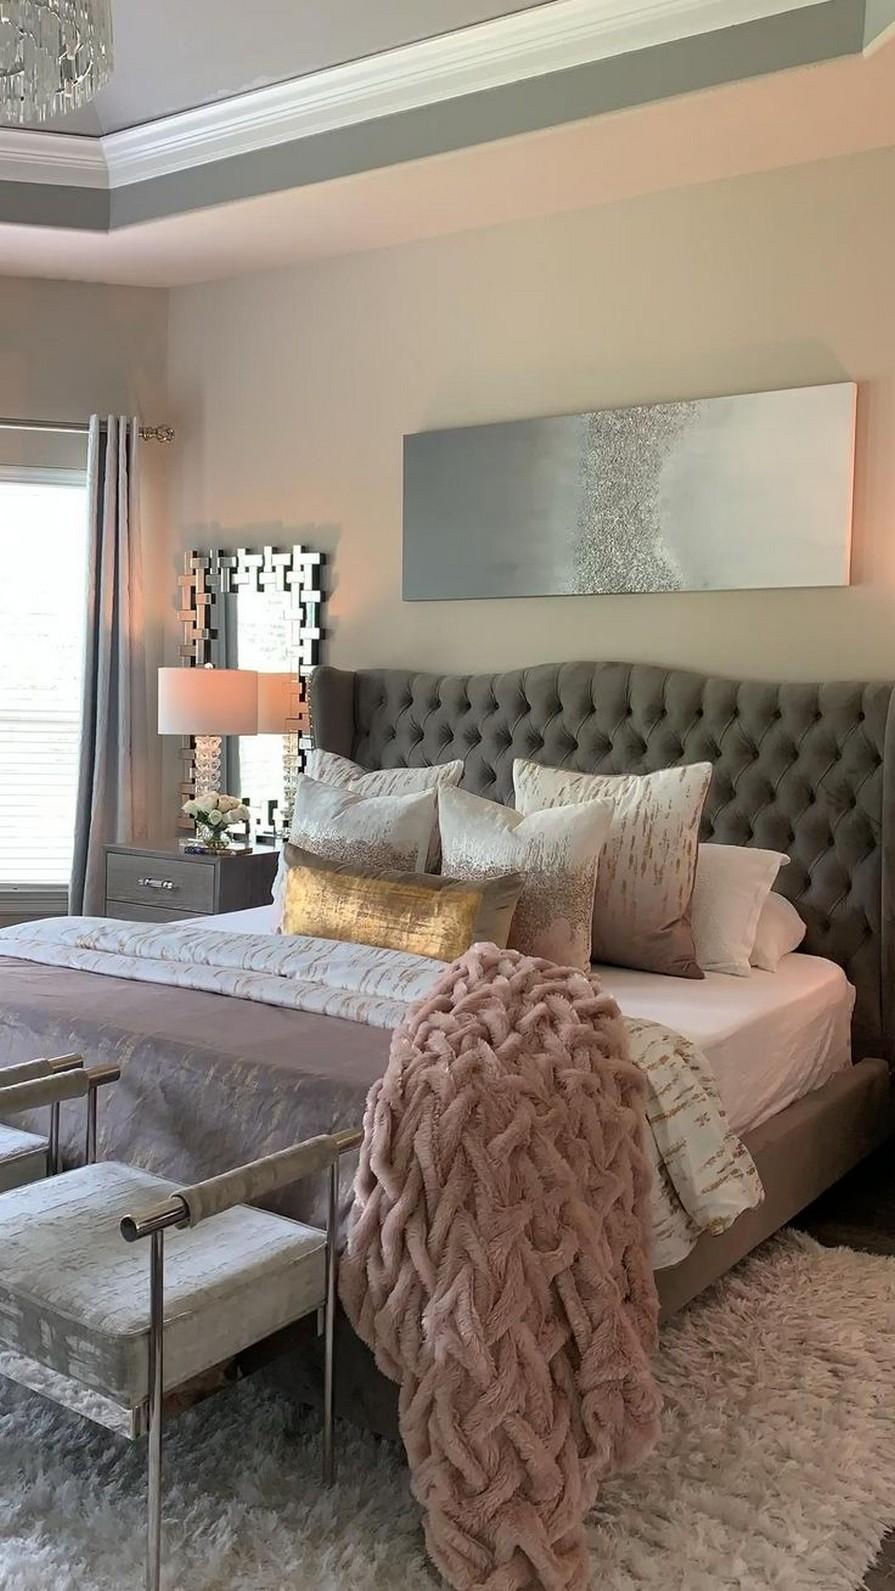 10 Furniture Designs For Bedroom Home Decor 12